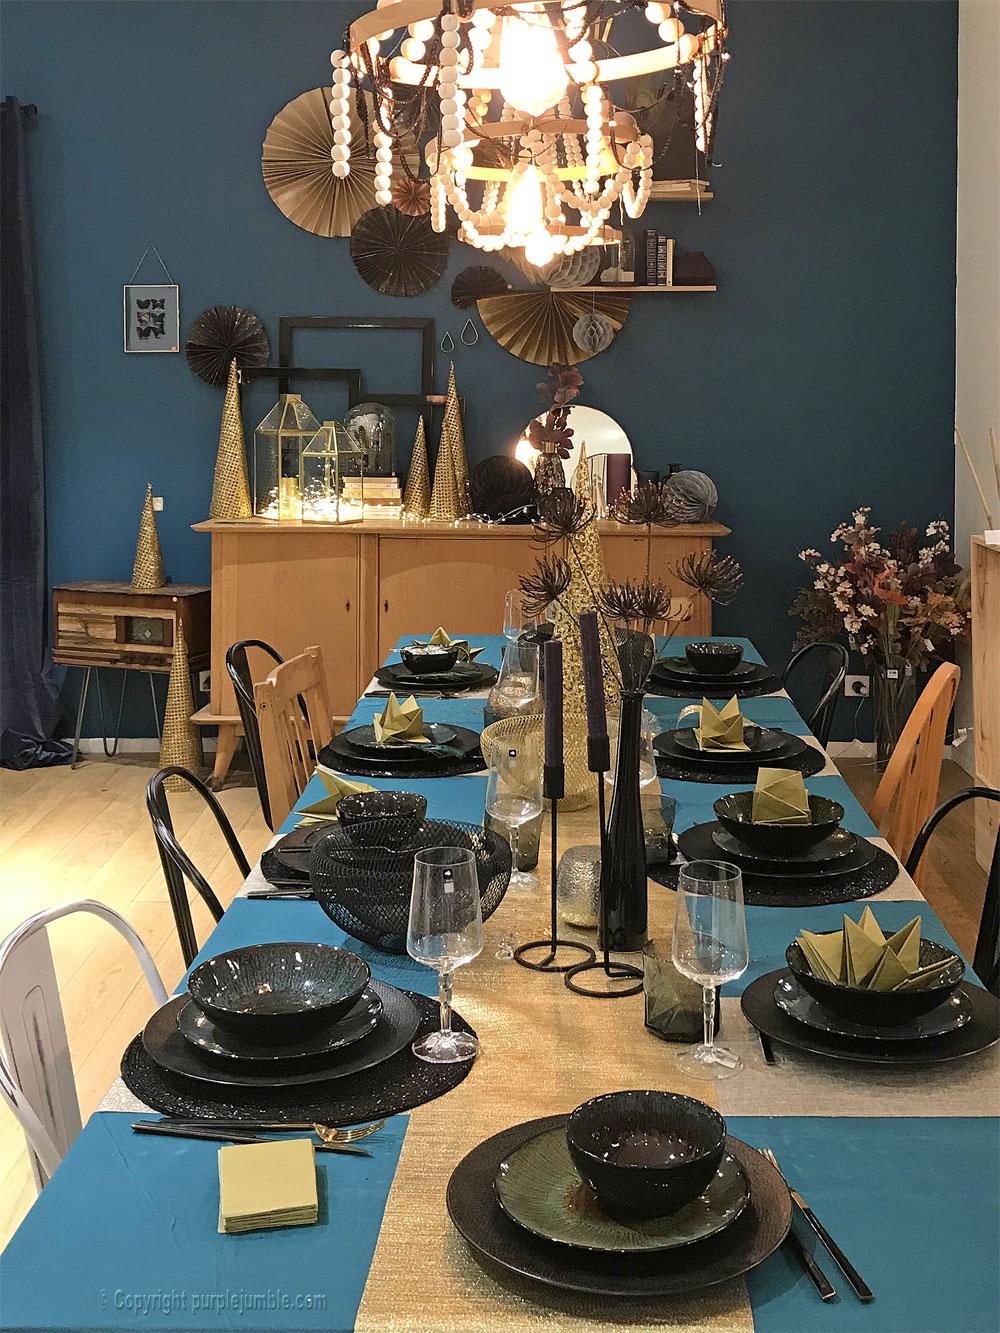 zodio noel 2018 deco maison table